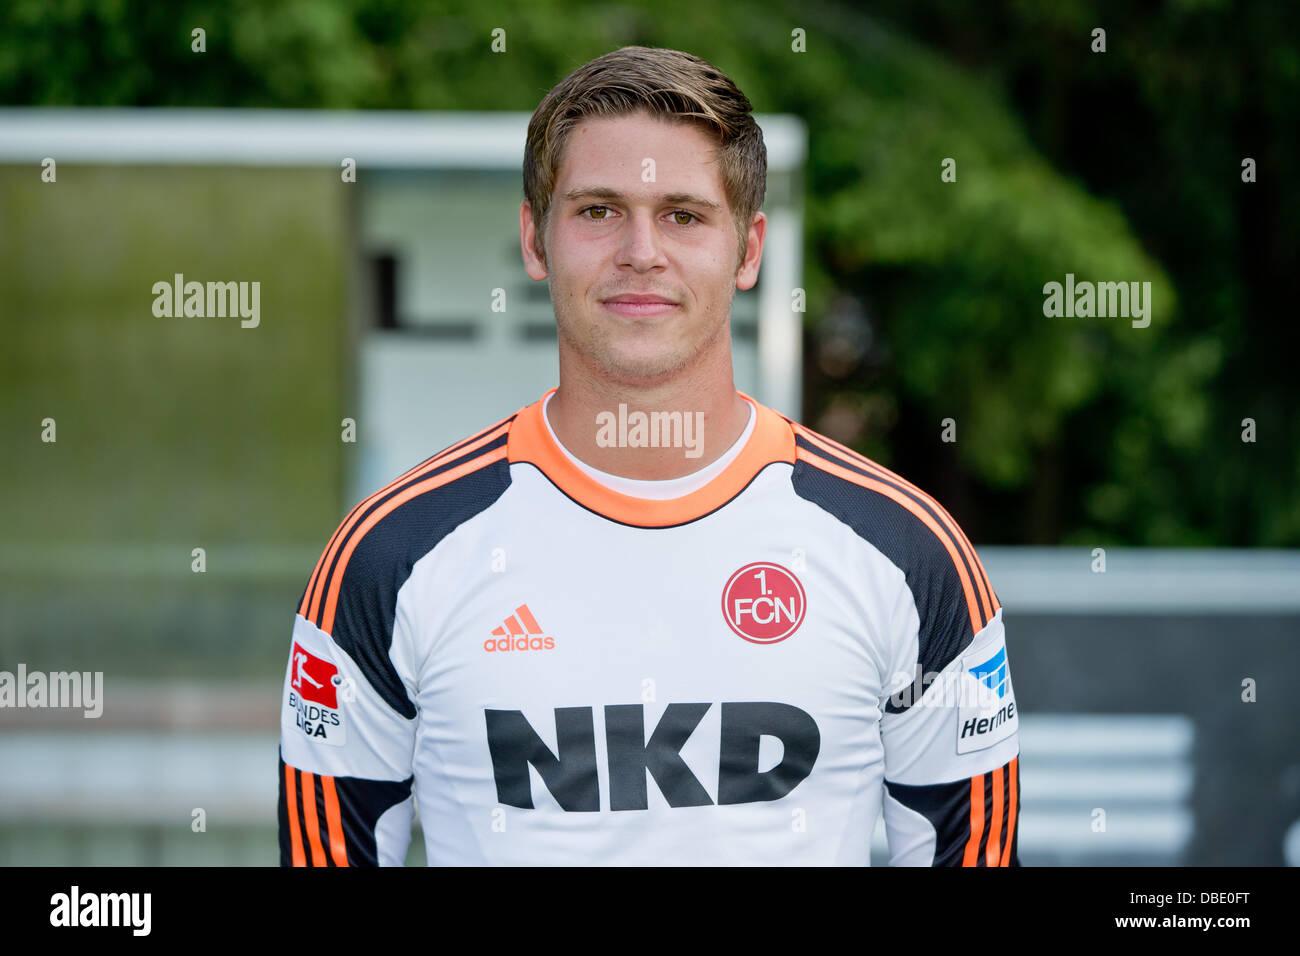 Goalie Patrick Rakovsky of German Bundesliga club 1. FC Nurnberg during the official photocall for the season 2013 - Stock Image